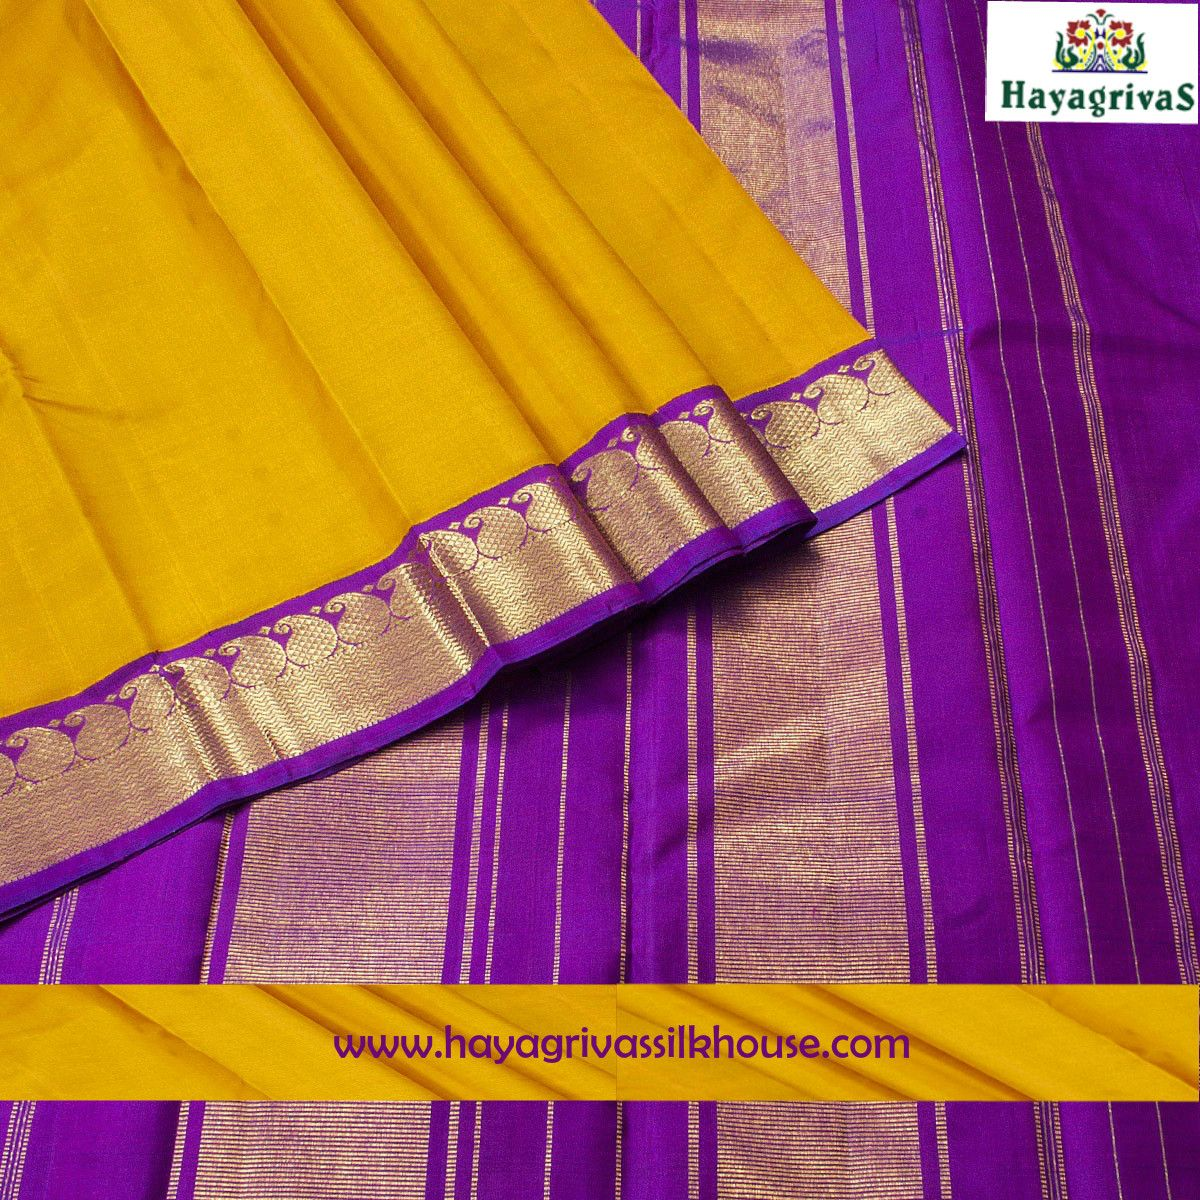 Gorgeous Yellow and Purple combo weaved pure Kanjivaram from Hayagrivassilkhouse. The silk saree has yellow color on the body and purple color on the pallu along with beautiful zari mango motifs on the border. #Silksarees #Kanjivaramsilks #Weddingsilks #Traditionalsilks Go for this Kanjivaram : https://www.hayagrivassilkhouse.com/saris/2776-2290.html Call us: 91 9840582892